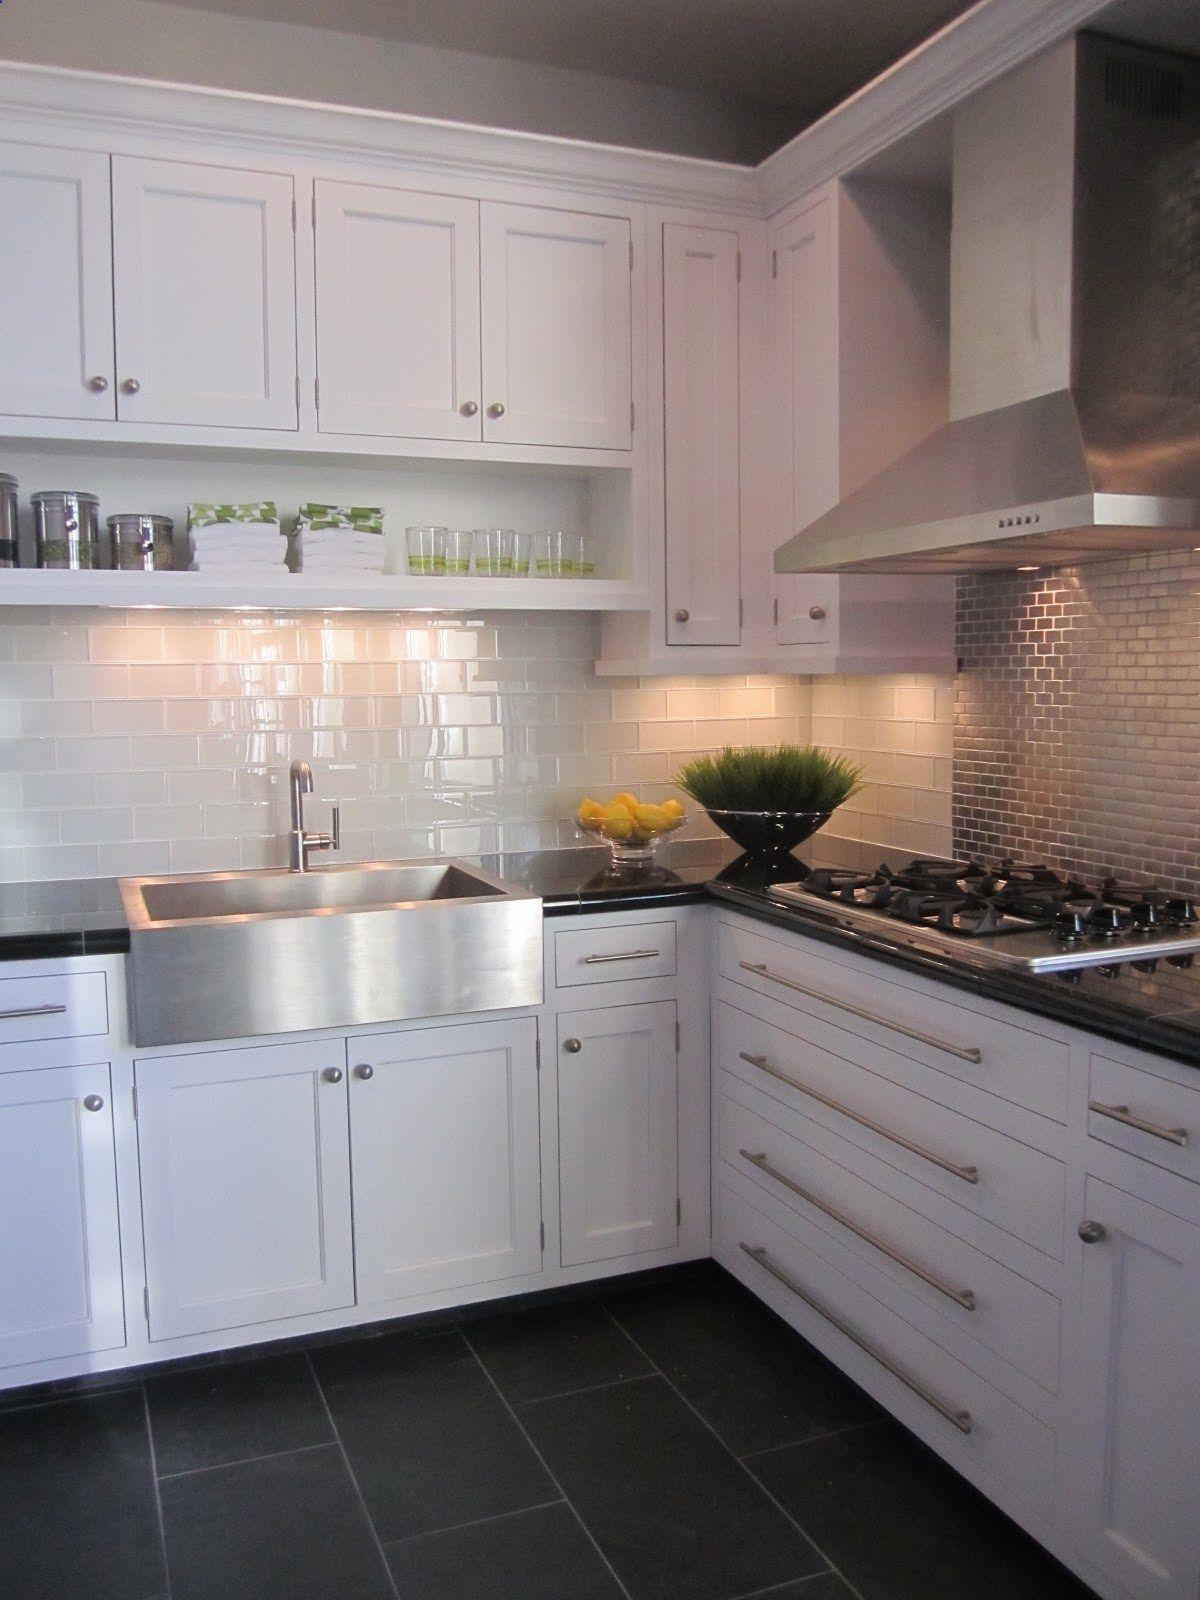 Dark Tile Floor Kitchen Modern Farmhouse Kitchengray Tile Floors White Cabinets